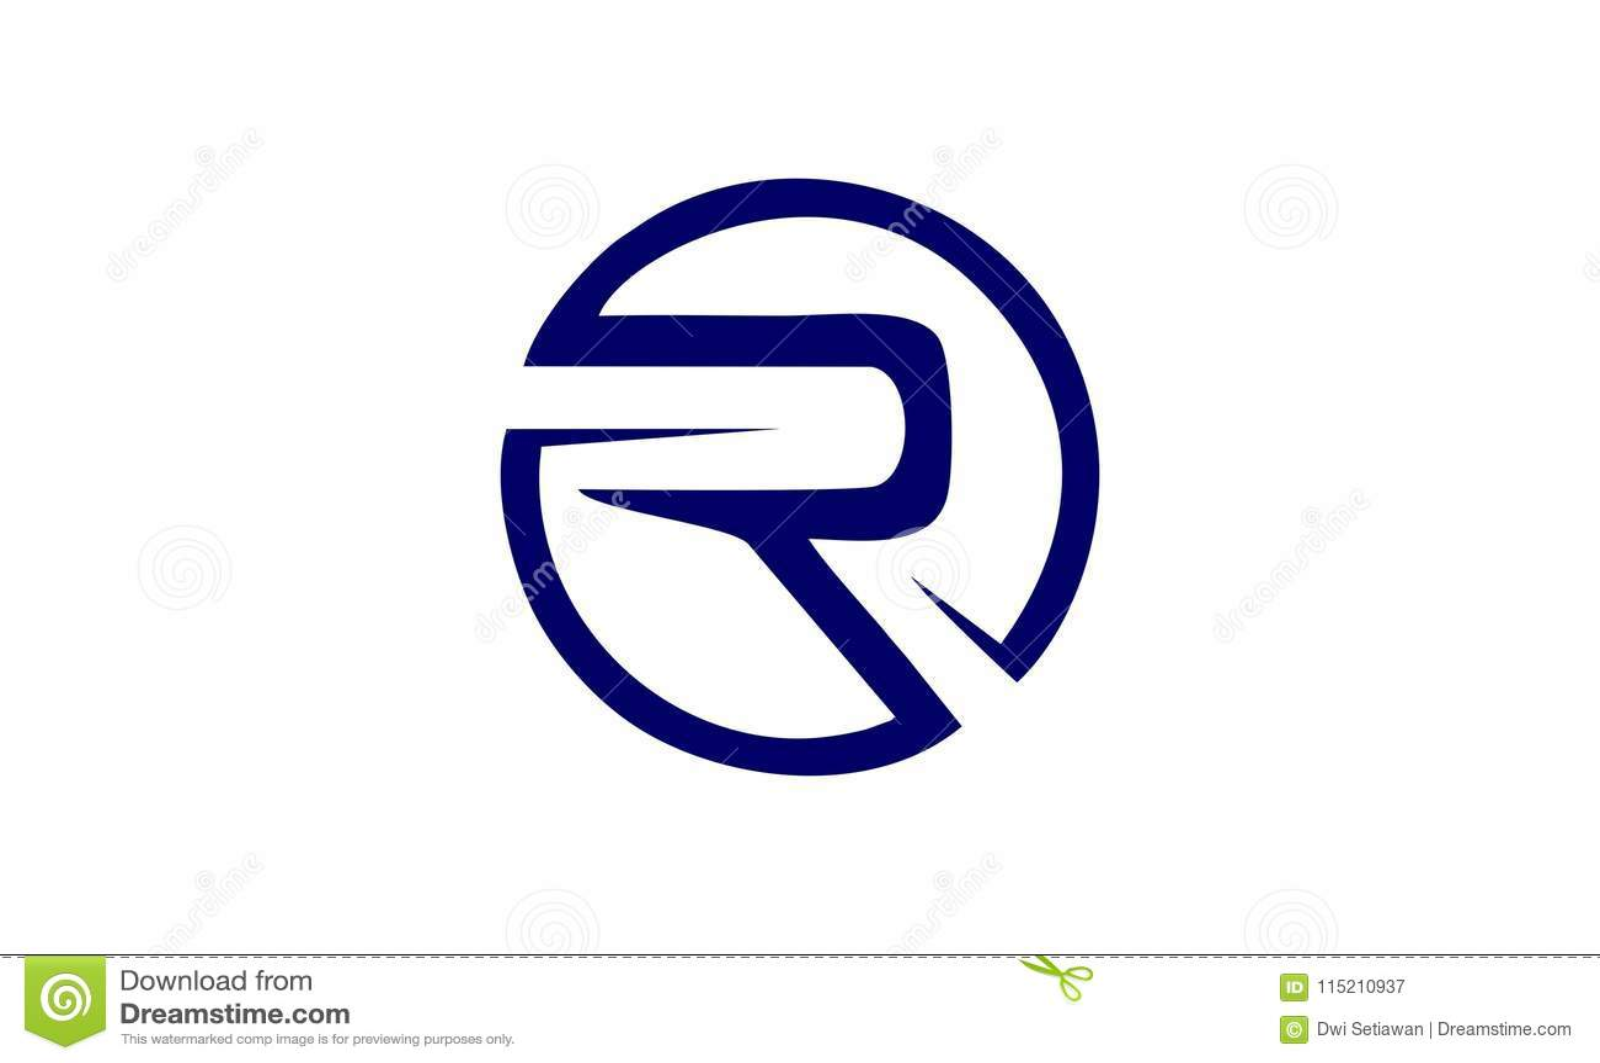 creative letter r design logo